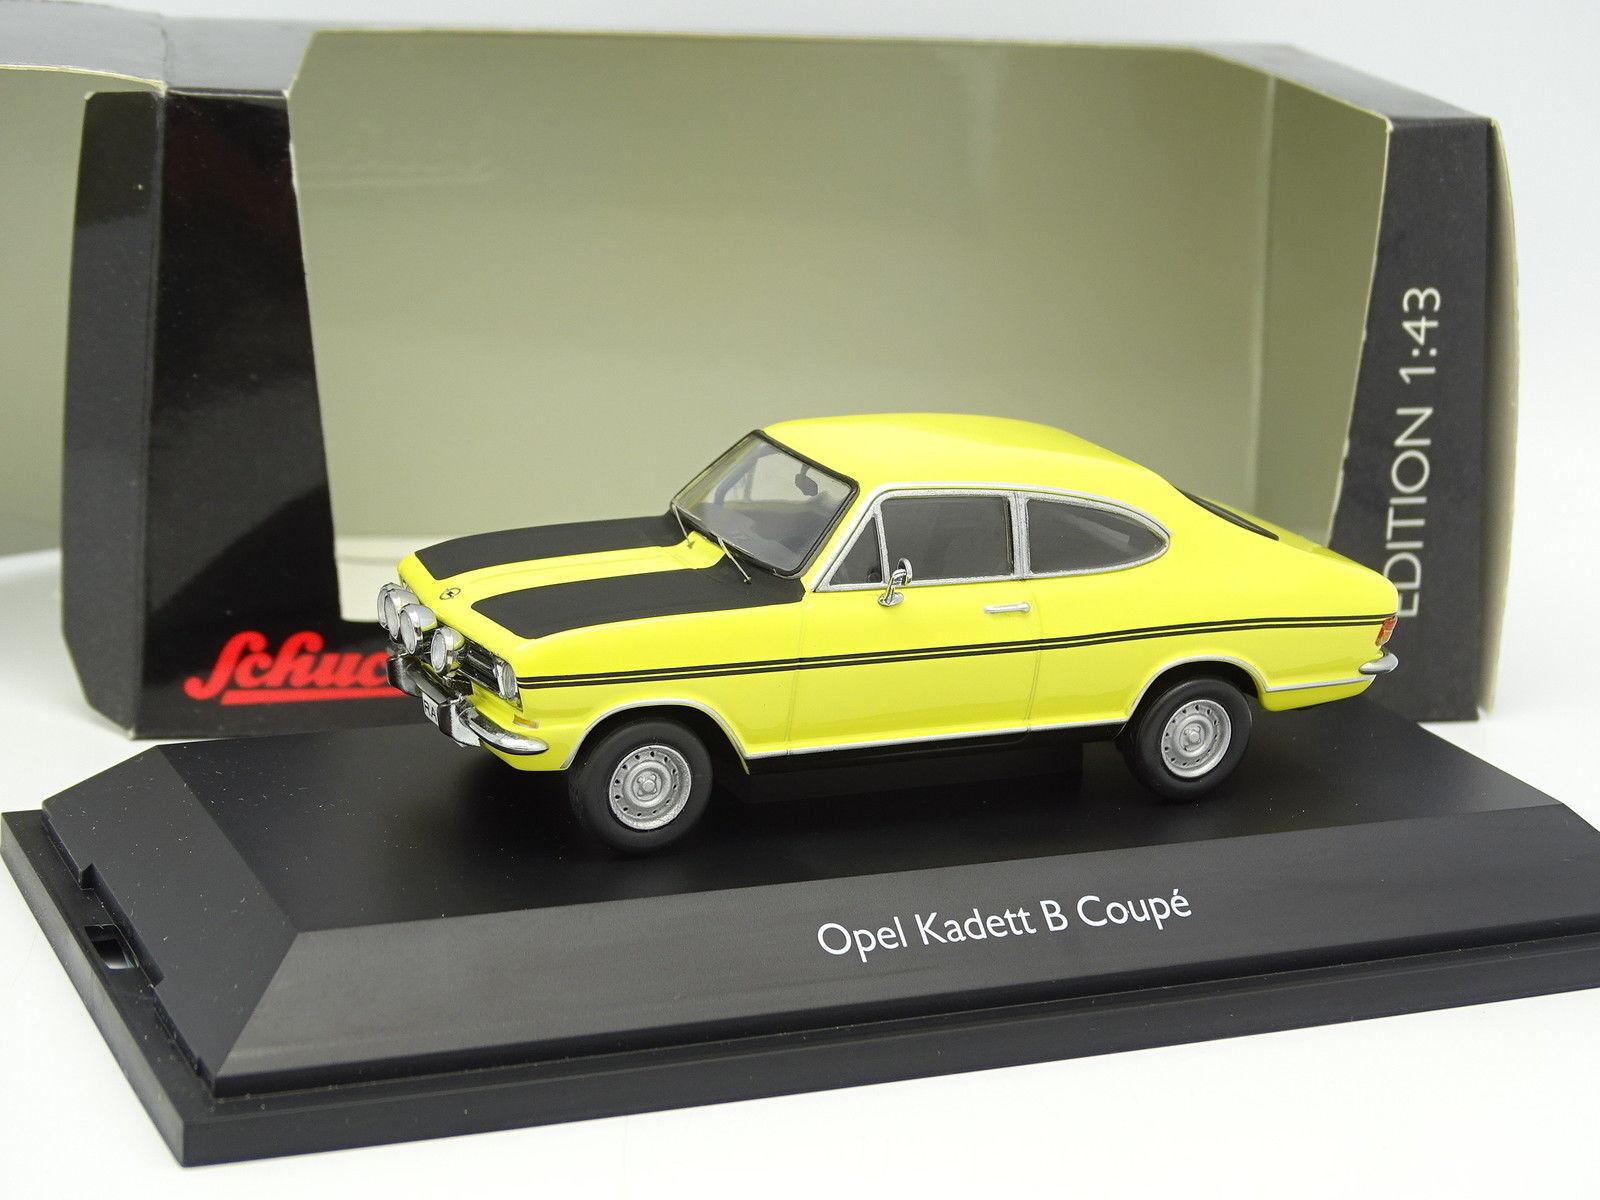 Schuco 1/43 - Opel Kadett B Coupé Gialla Strisce Nere